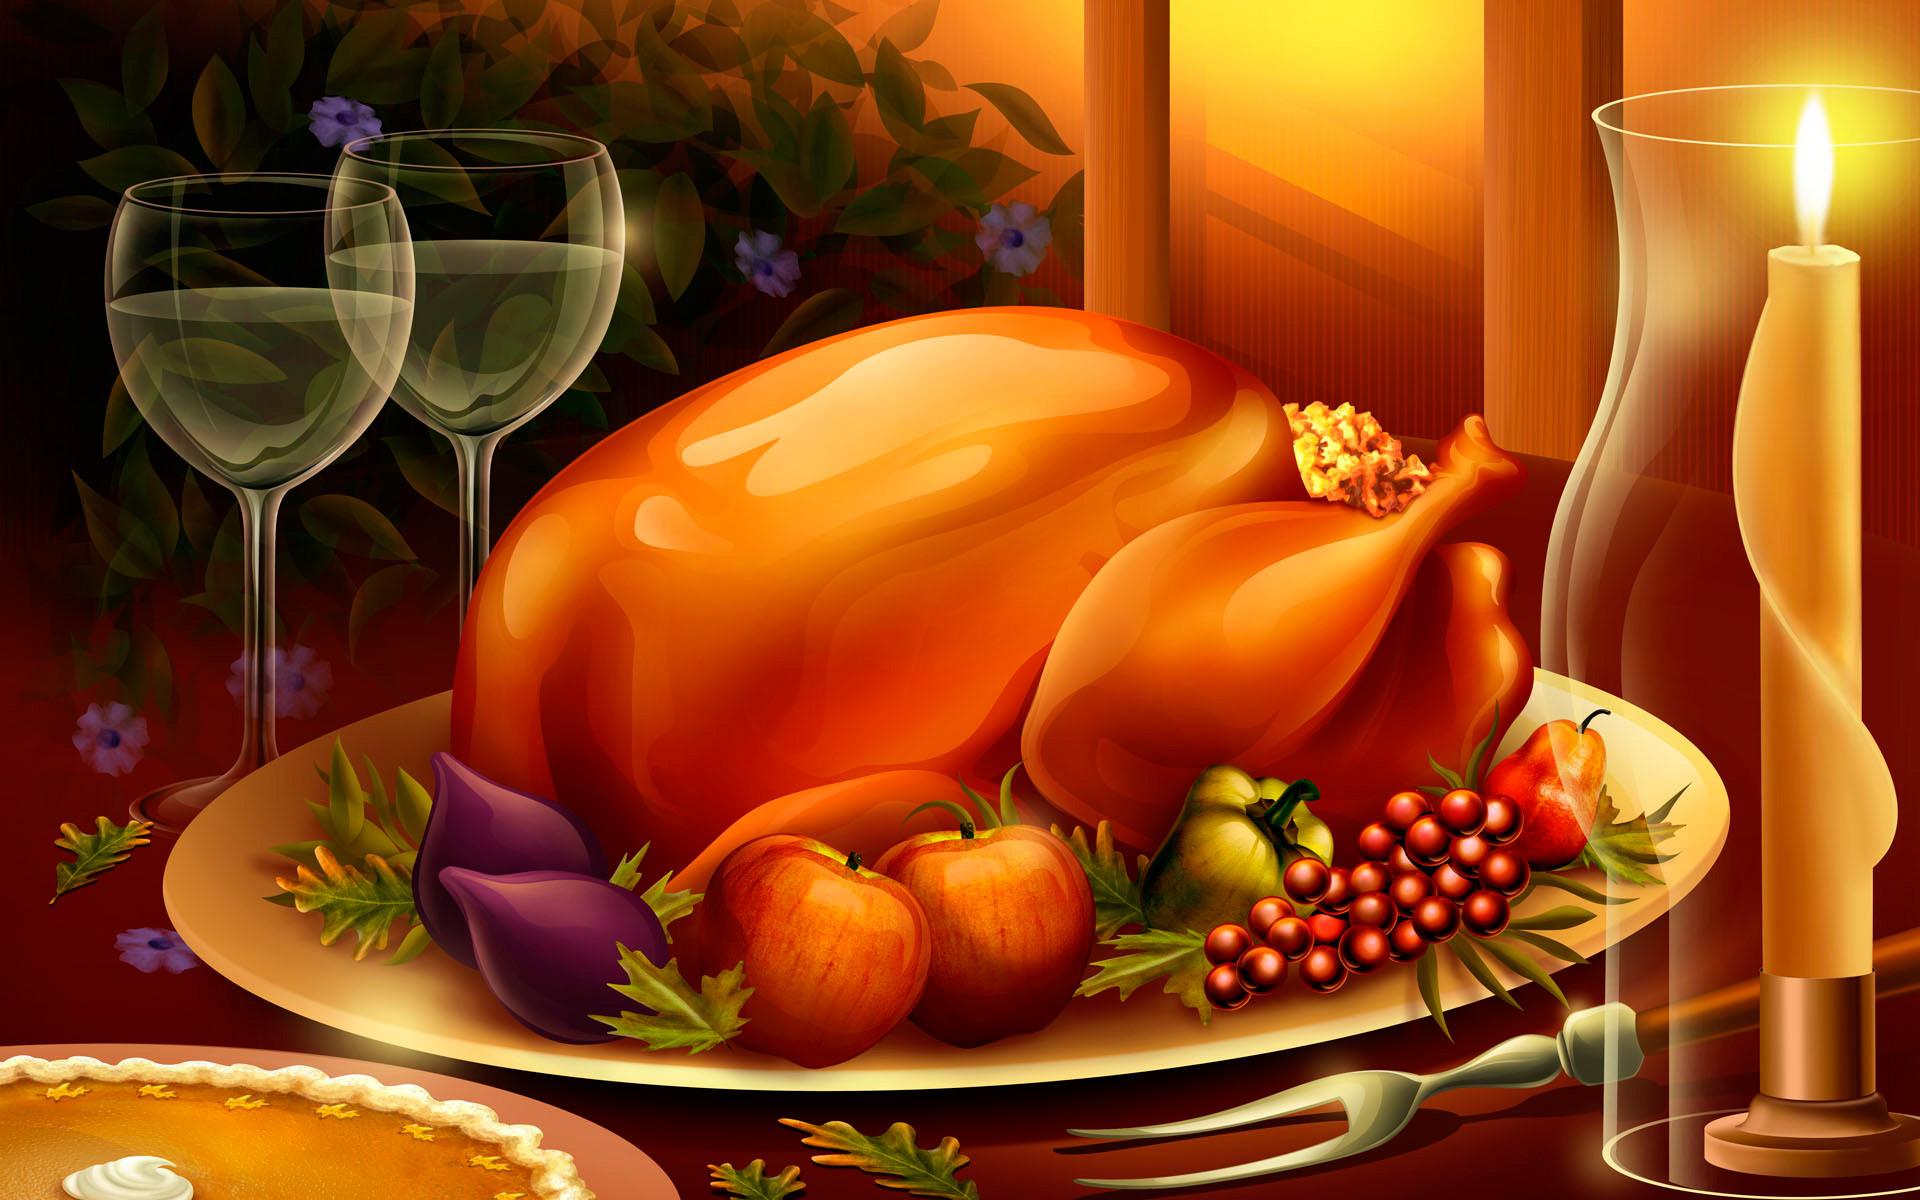 Thanksgiving Turkey Wallpaper  Thanksgiving Wallpaper Download Desktop Thanksgiving